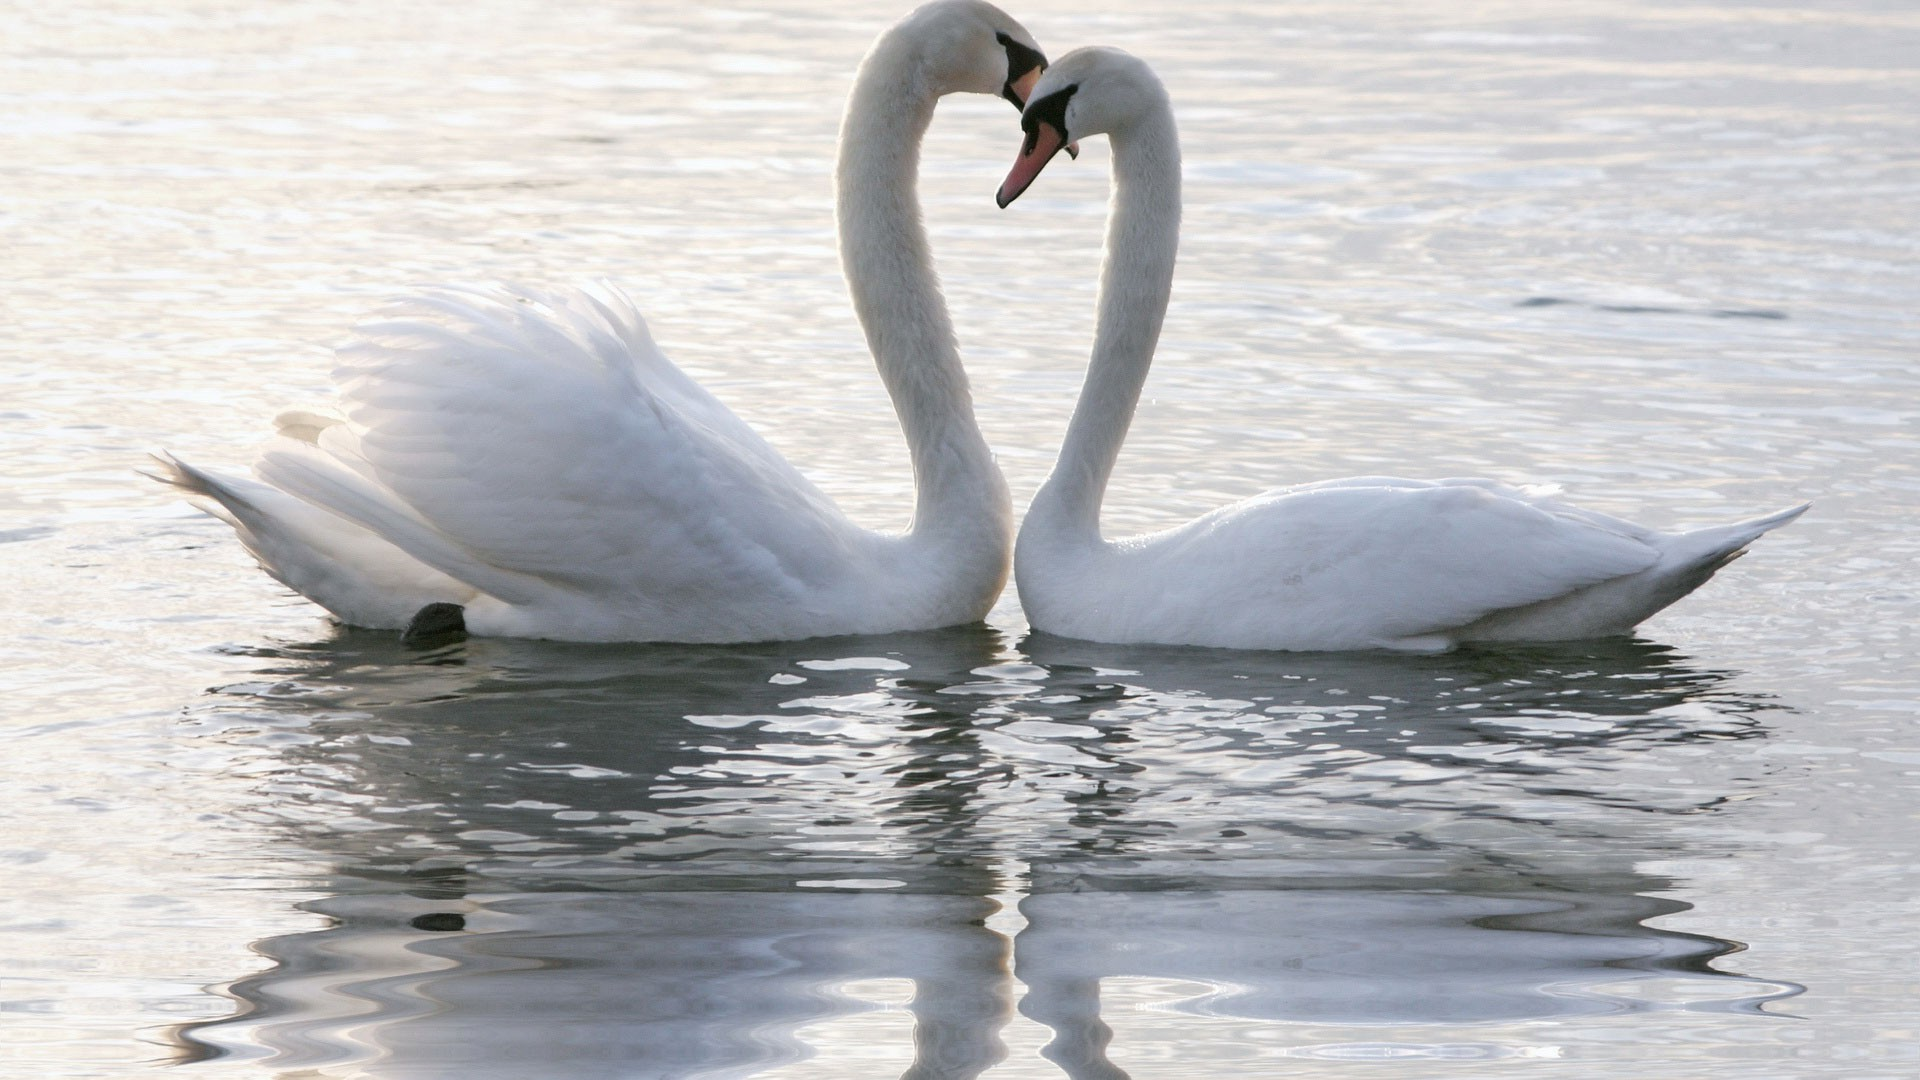 Swan hd wallpaper download